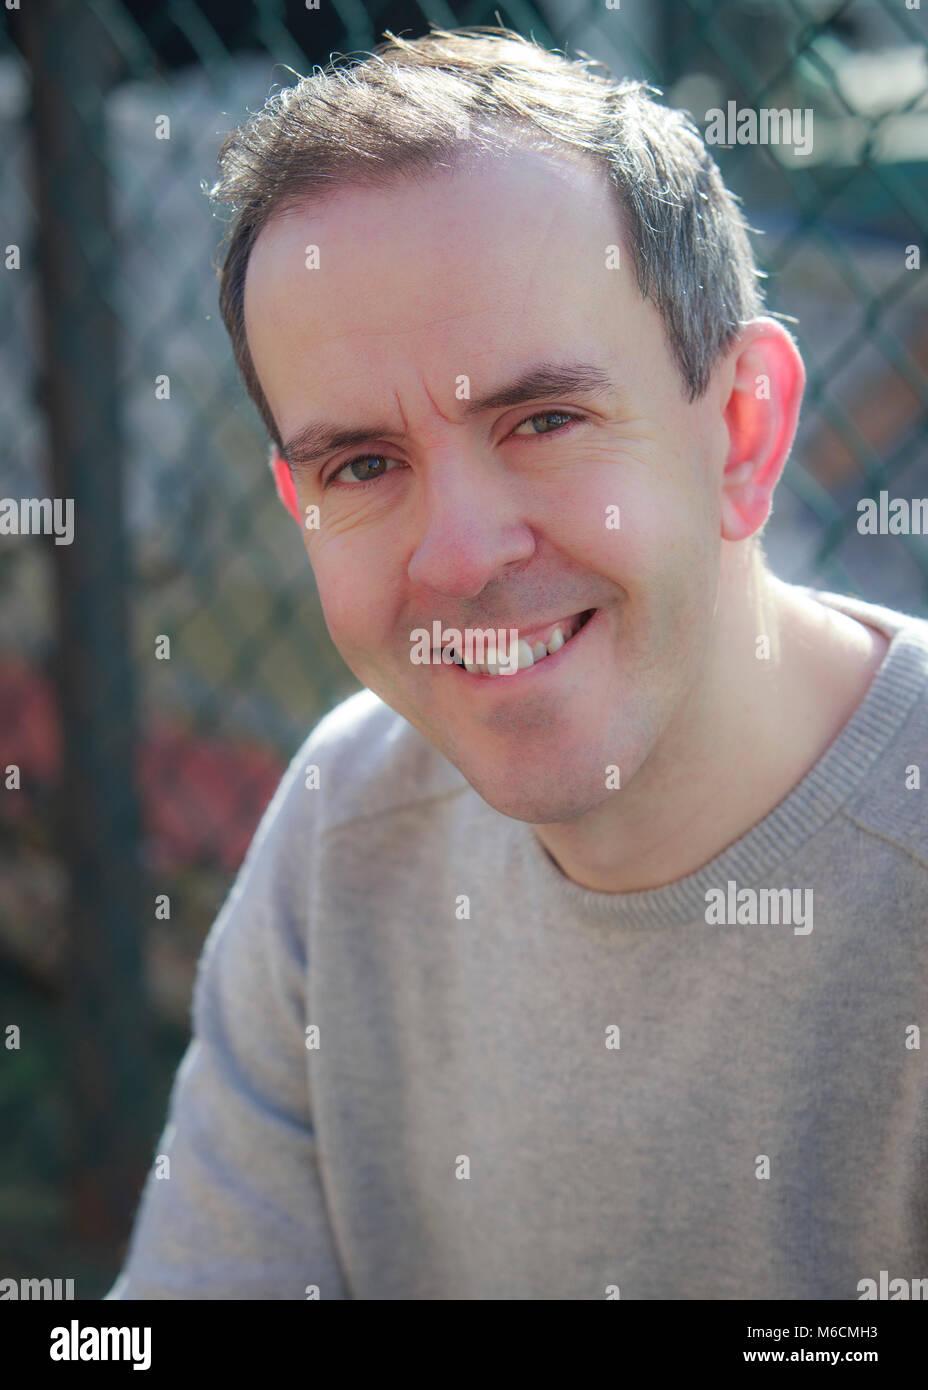 David Anthony Green, Actor, Headshot © Clarissa Debenham / Alamy - Stock Image